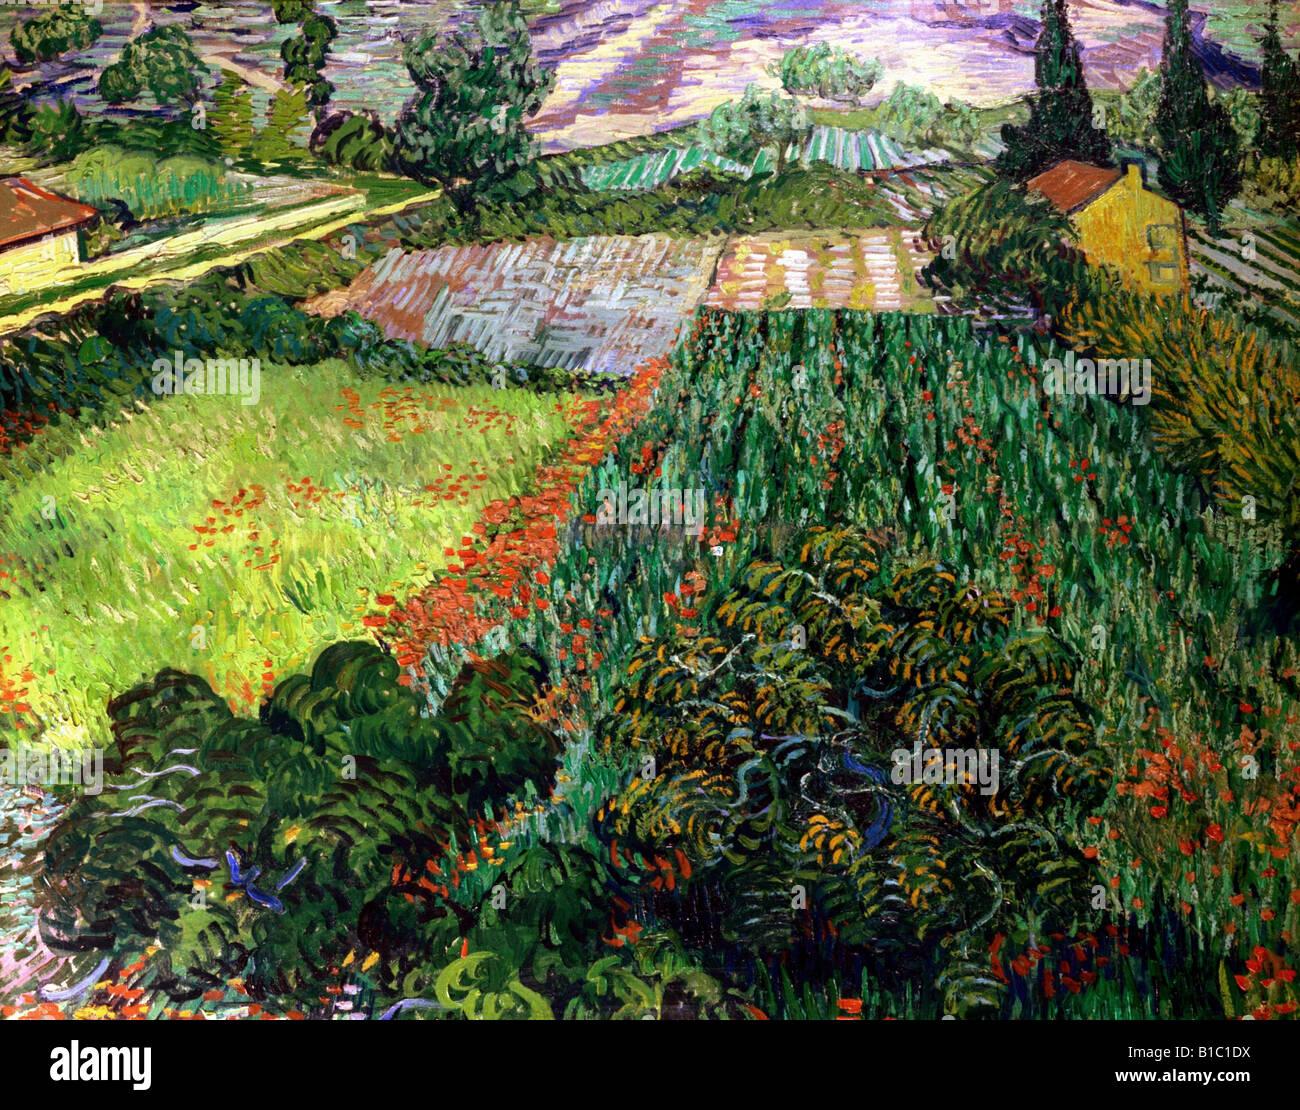 "fine arts, Gogh, Vincent van, (1853 - 1890), painting, ""poppy field,"", 1889 / 1890, oil on canvas, 71 cm x 91 cm, Stock Foto"